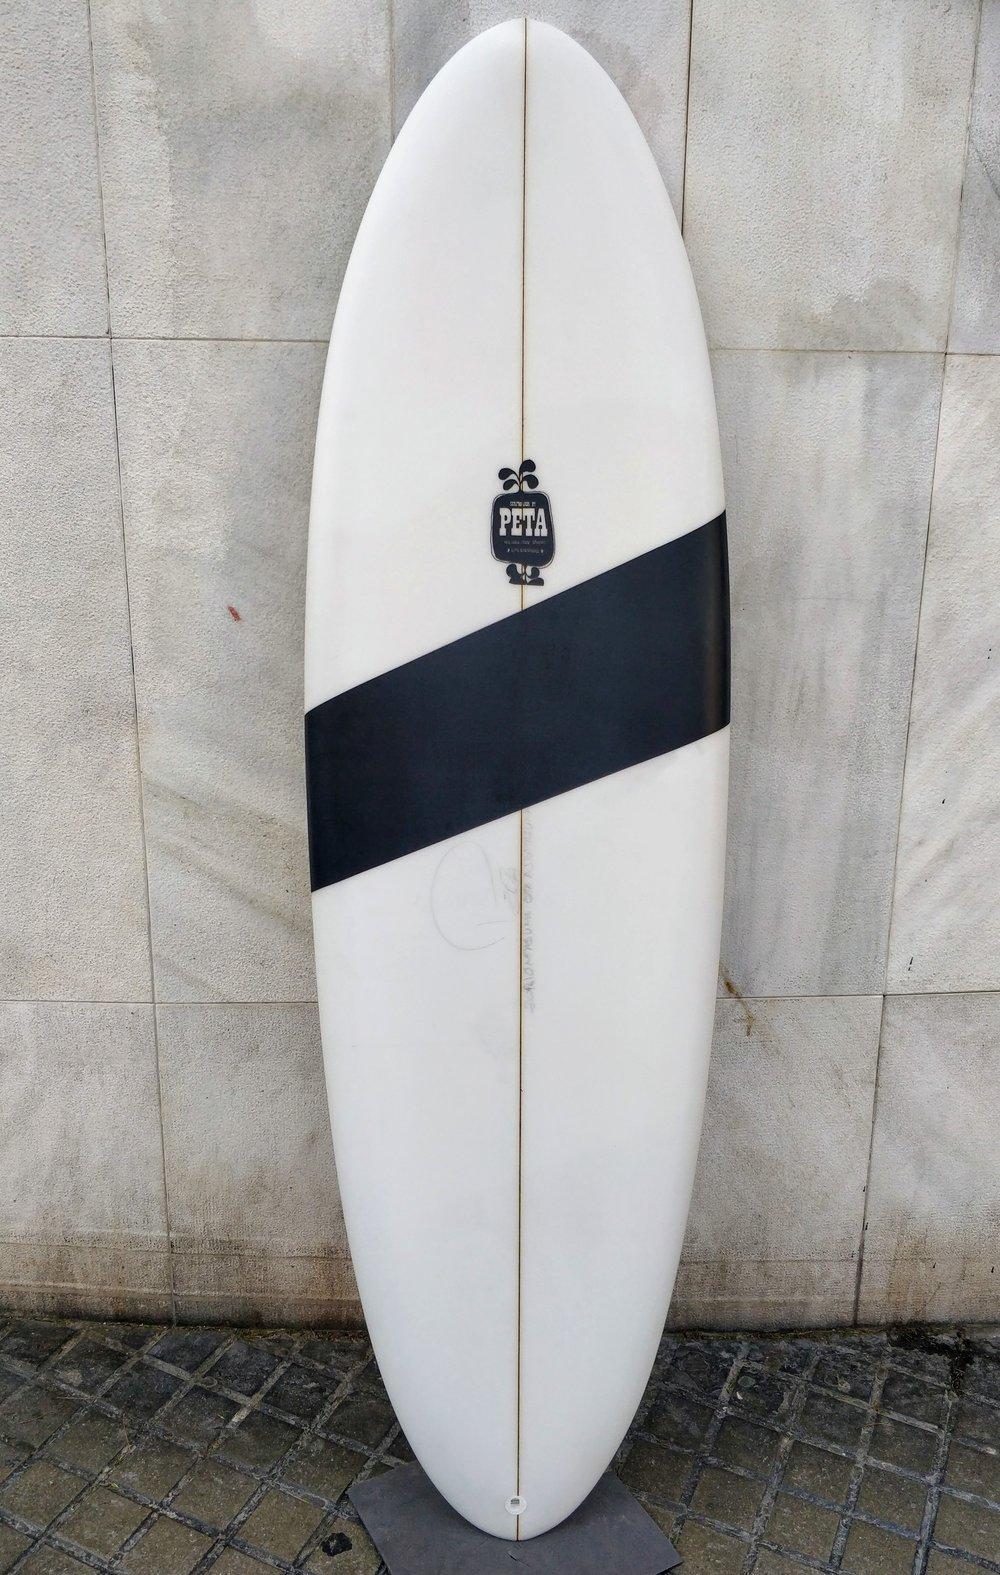 TABLA SURF PETA SURFBOARDS MODELO HUEVO EN PROMOCION